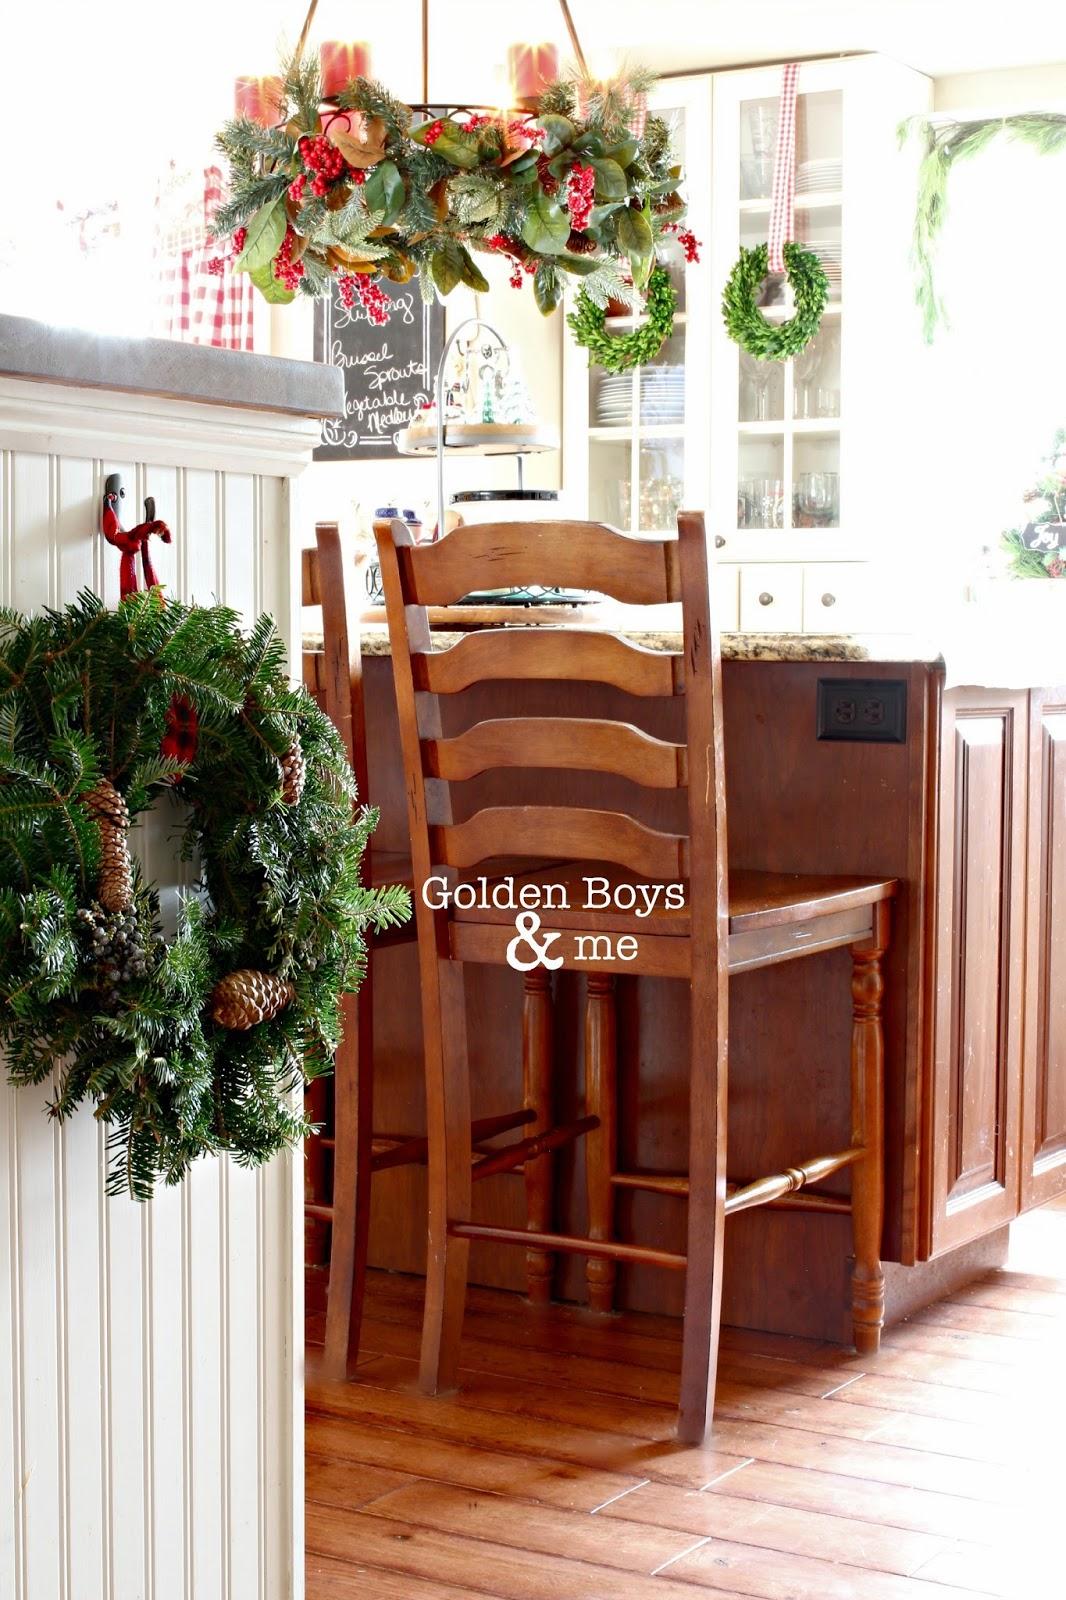 Candle chandelier over kitchen island-www.goldenboysandme.com